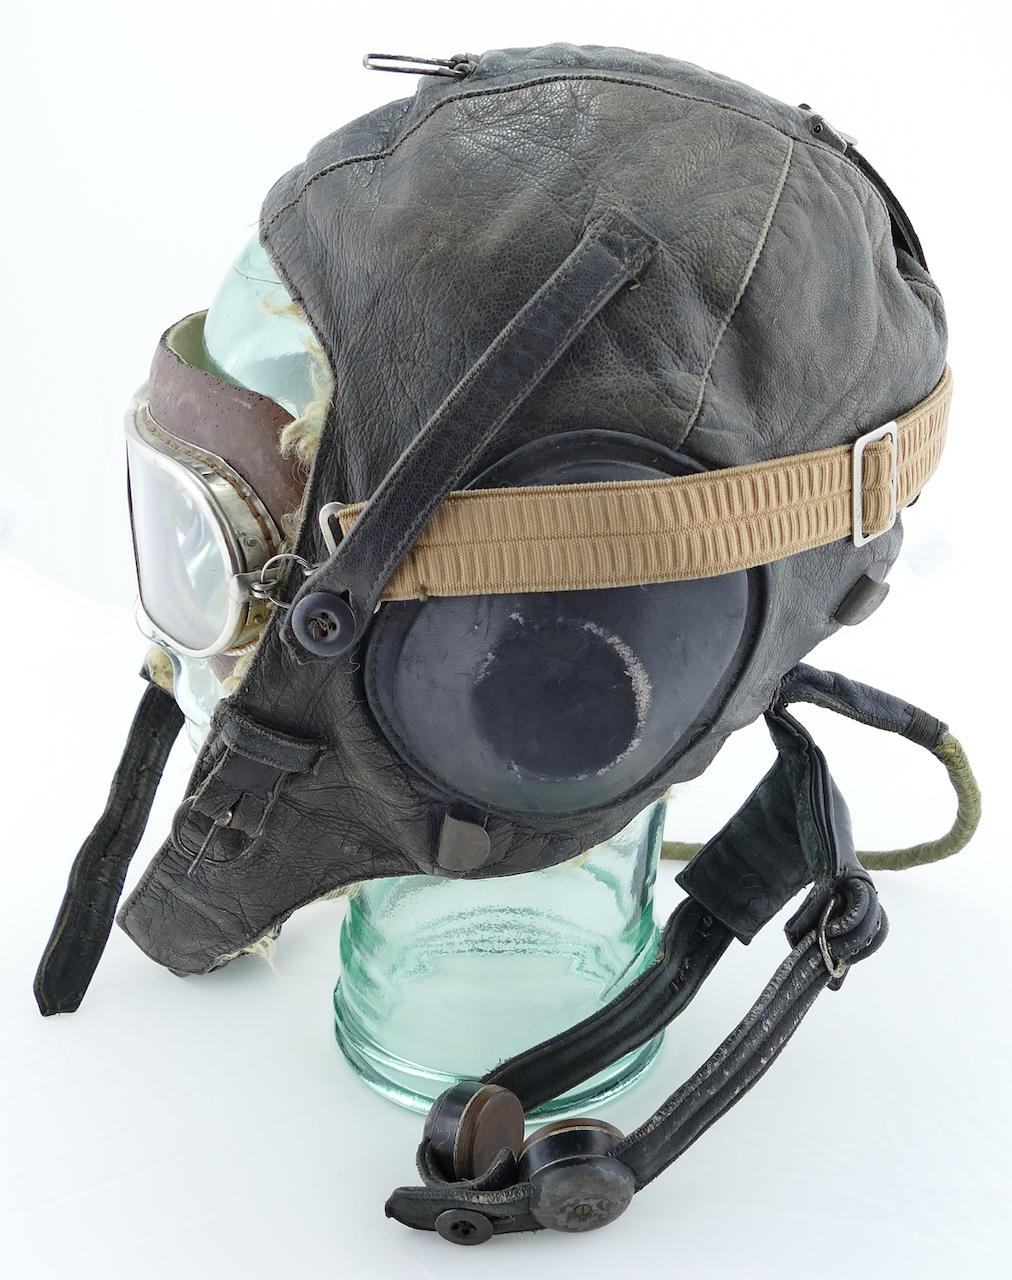 soviet_ww2_fur_lined_leather_flight_helmet_2.jpg